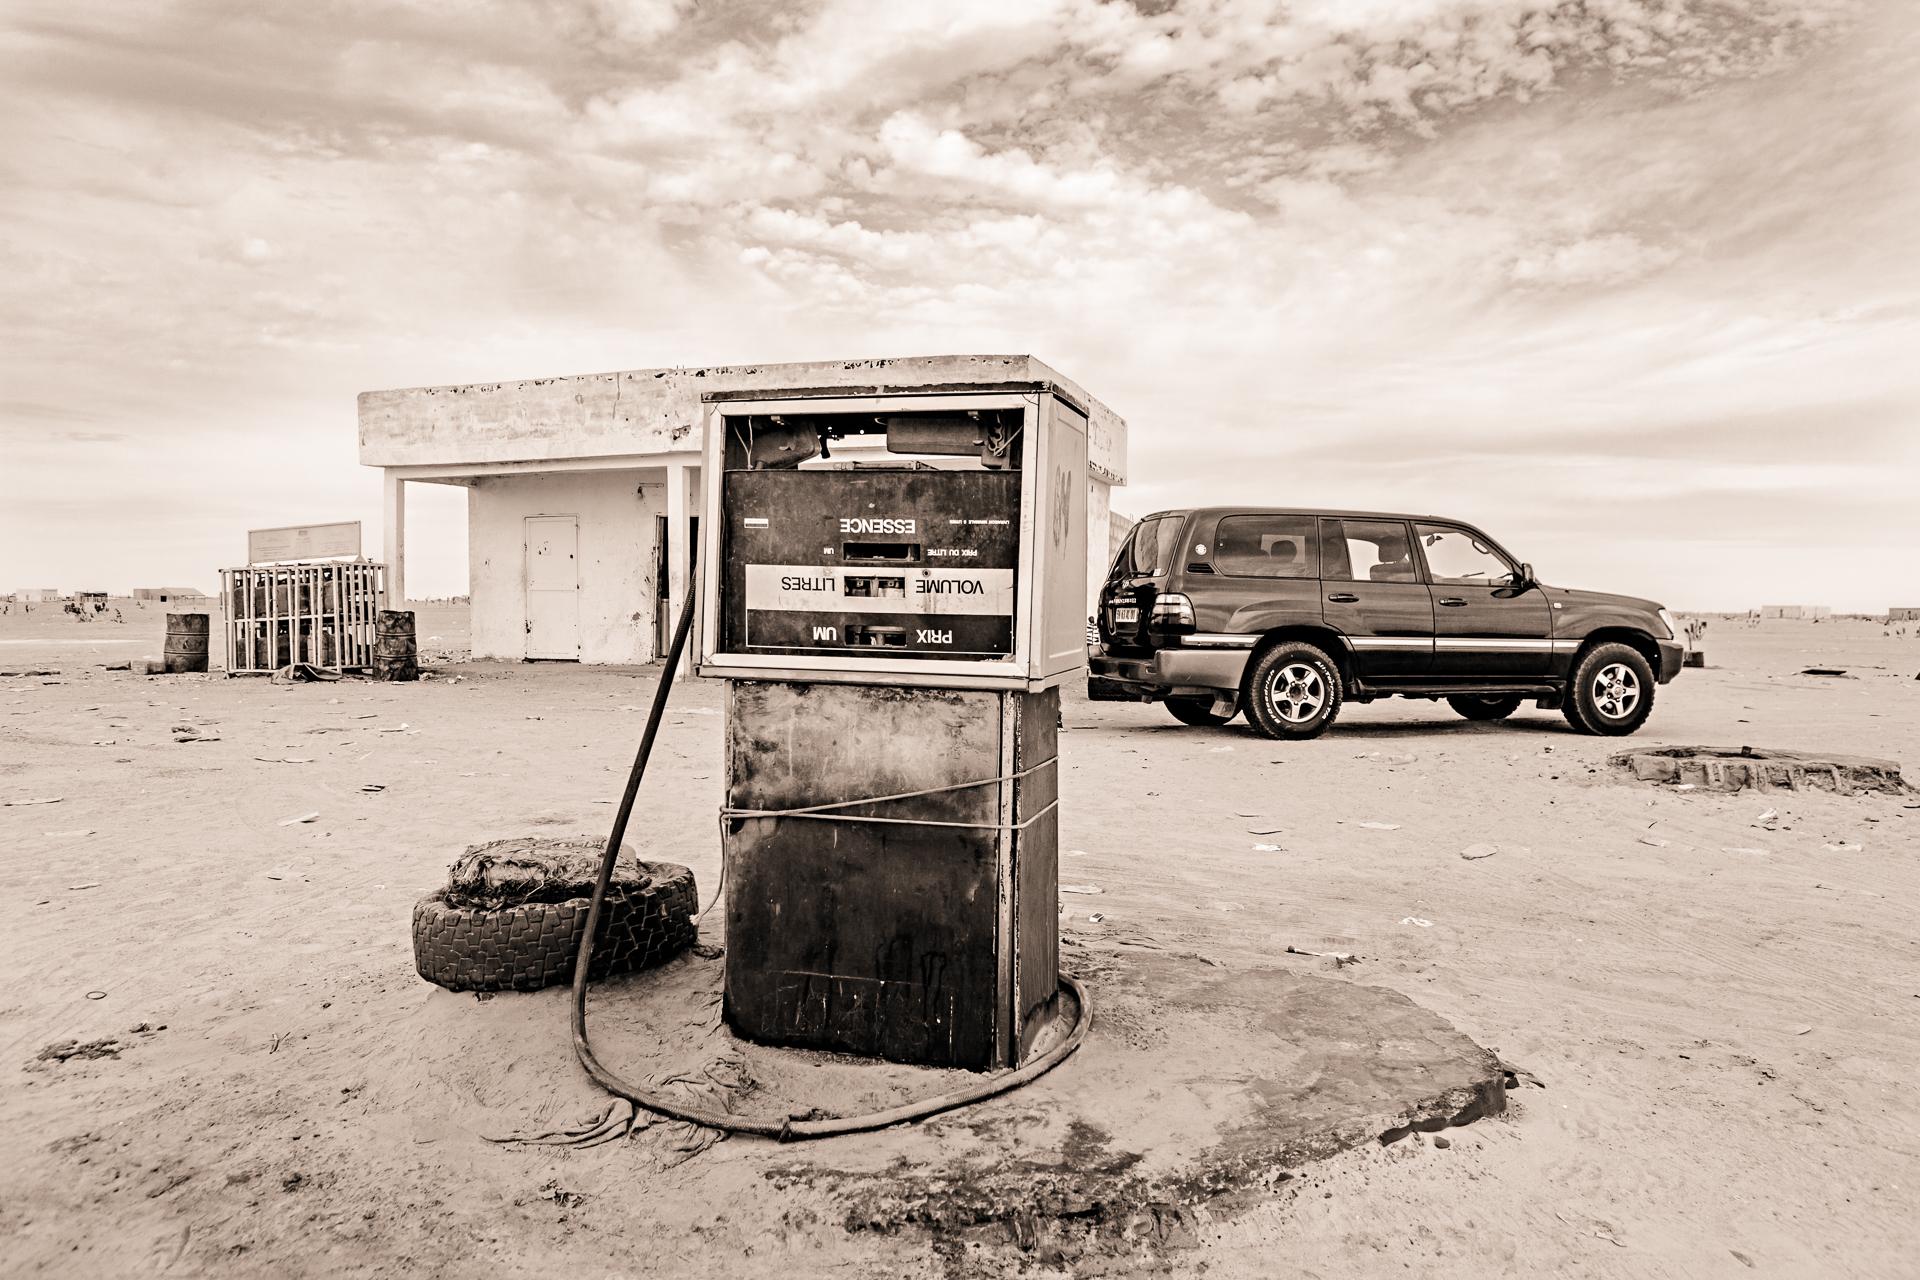 Station essence Nouakchott Atar Mauritanie